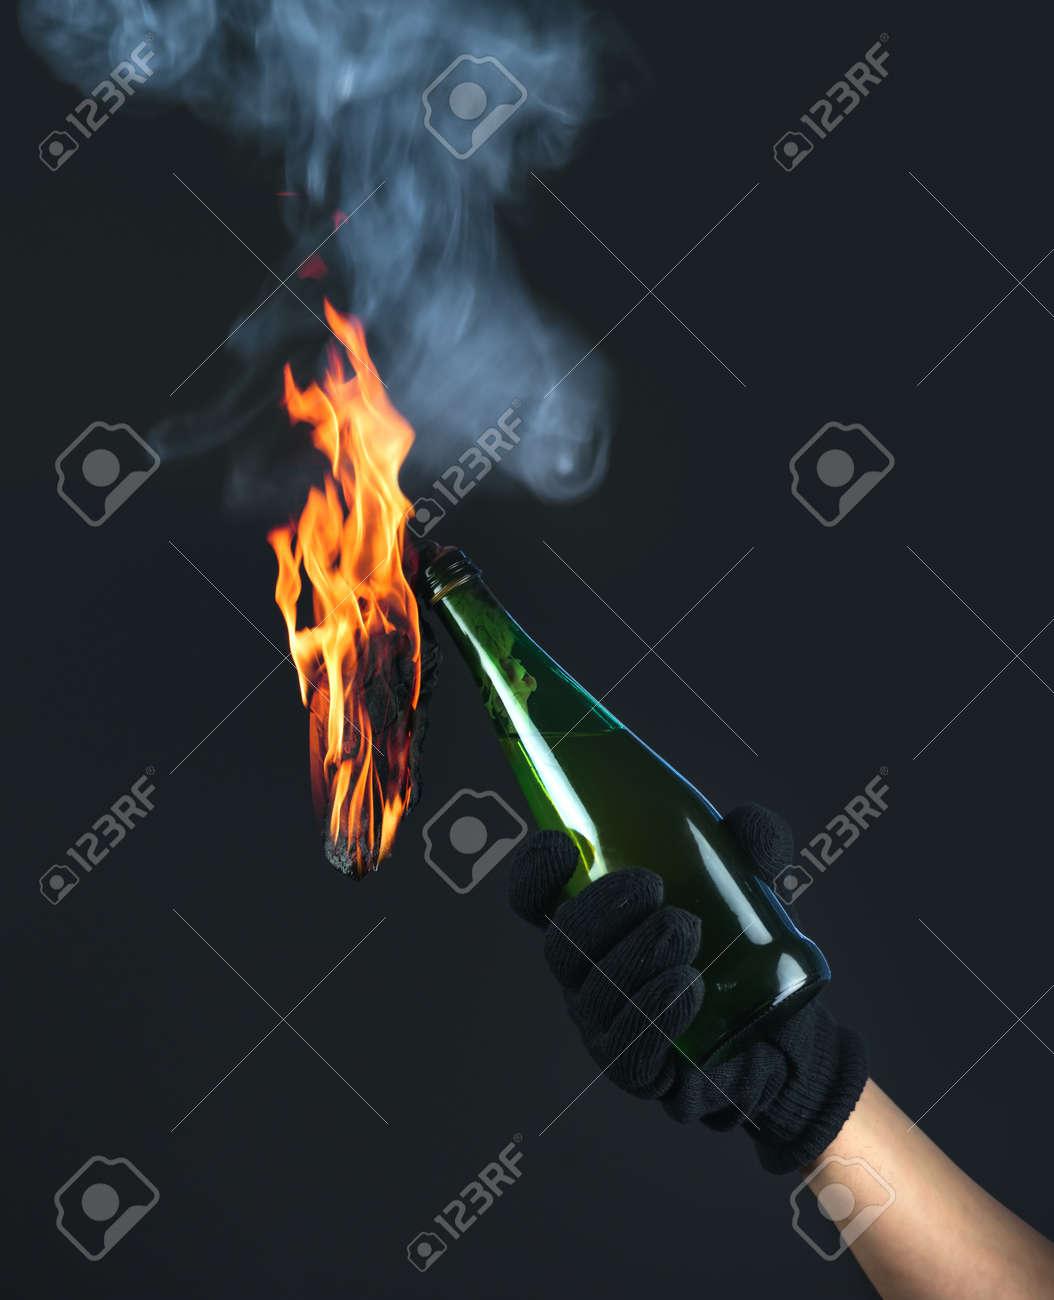 molotov cocktail in activist hand Stock Photo - 26561000